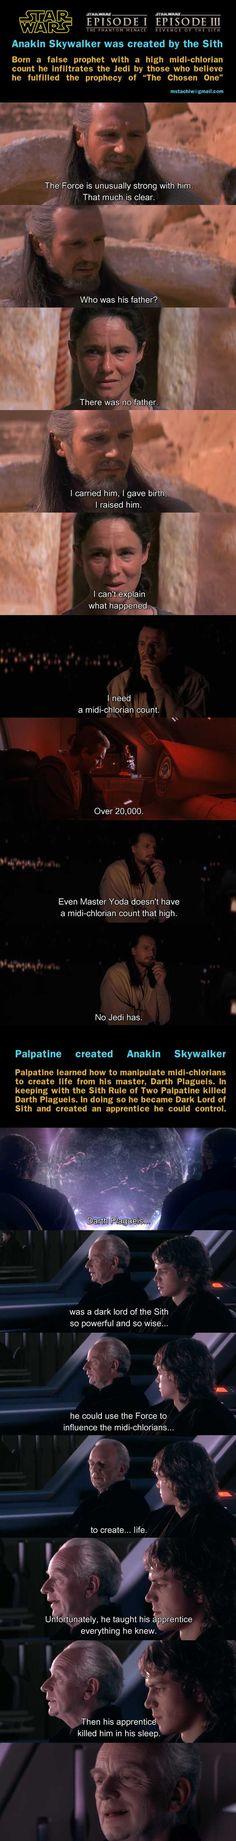 Anakin Skywalker was created by the Sith - Imgur